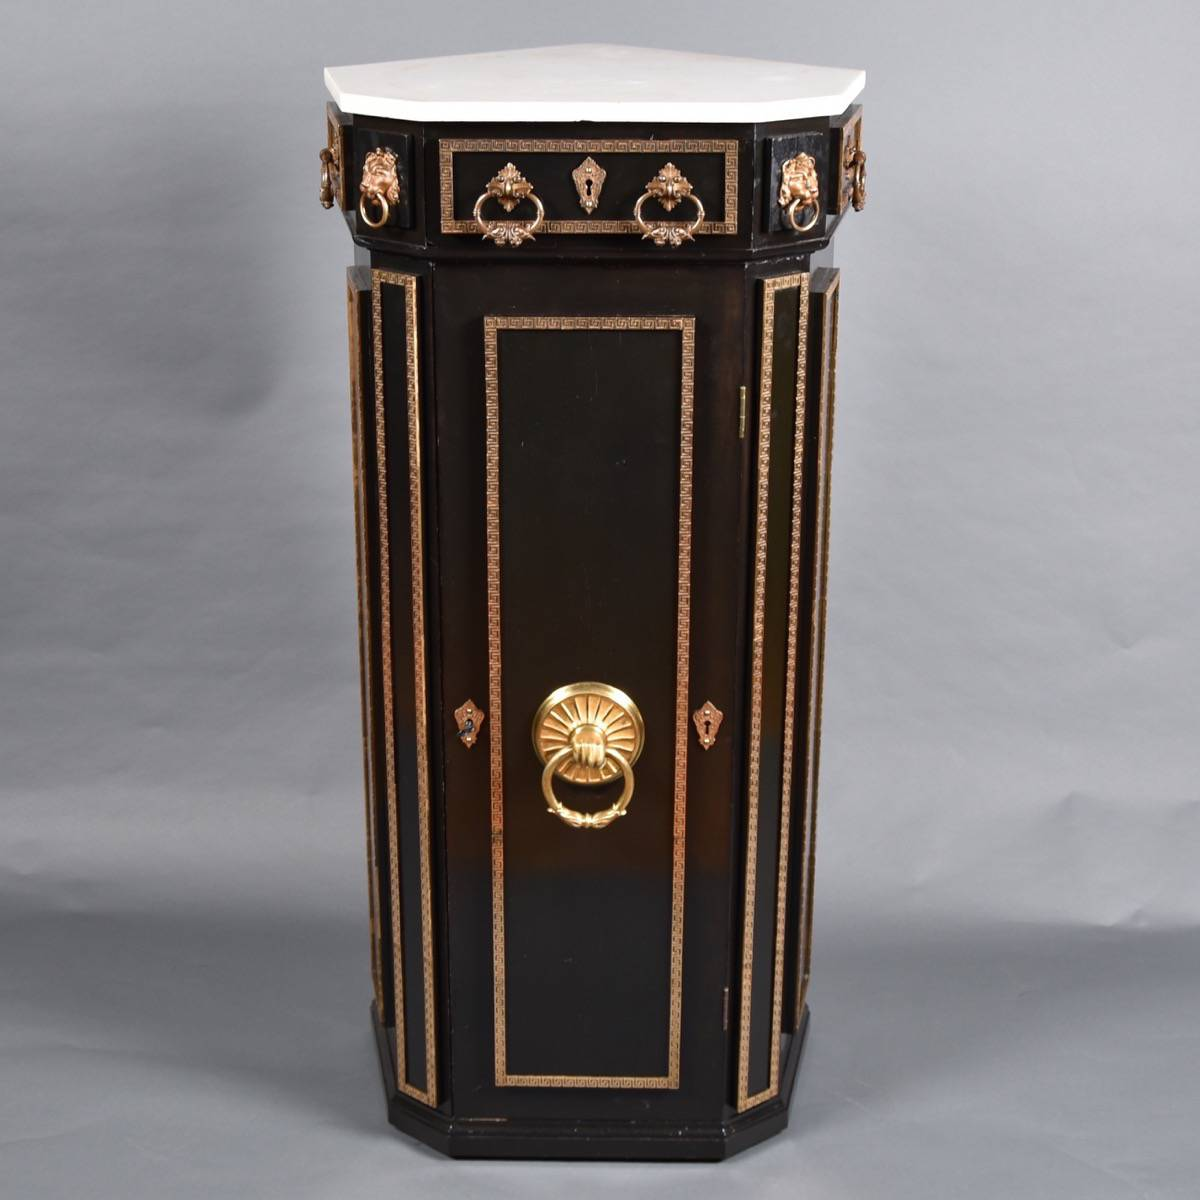 Antique Ebonized corner cupboard   De Grande Antique Furniture - Ebonized Corner Cupboard De Grande Antique Furniture